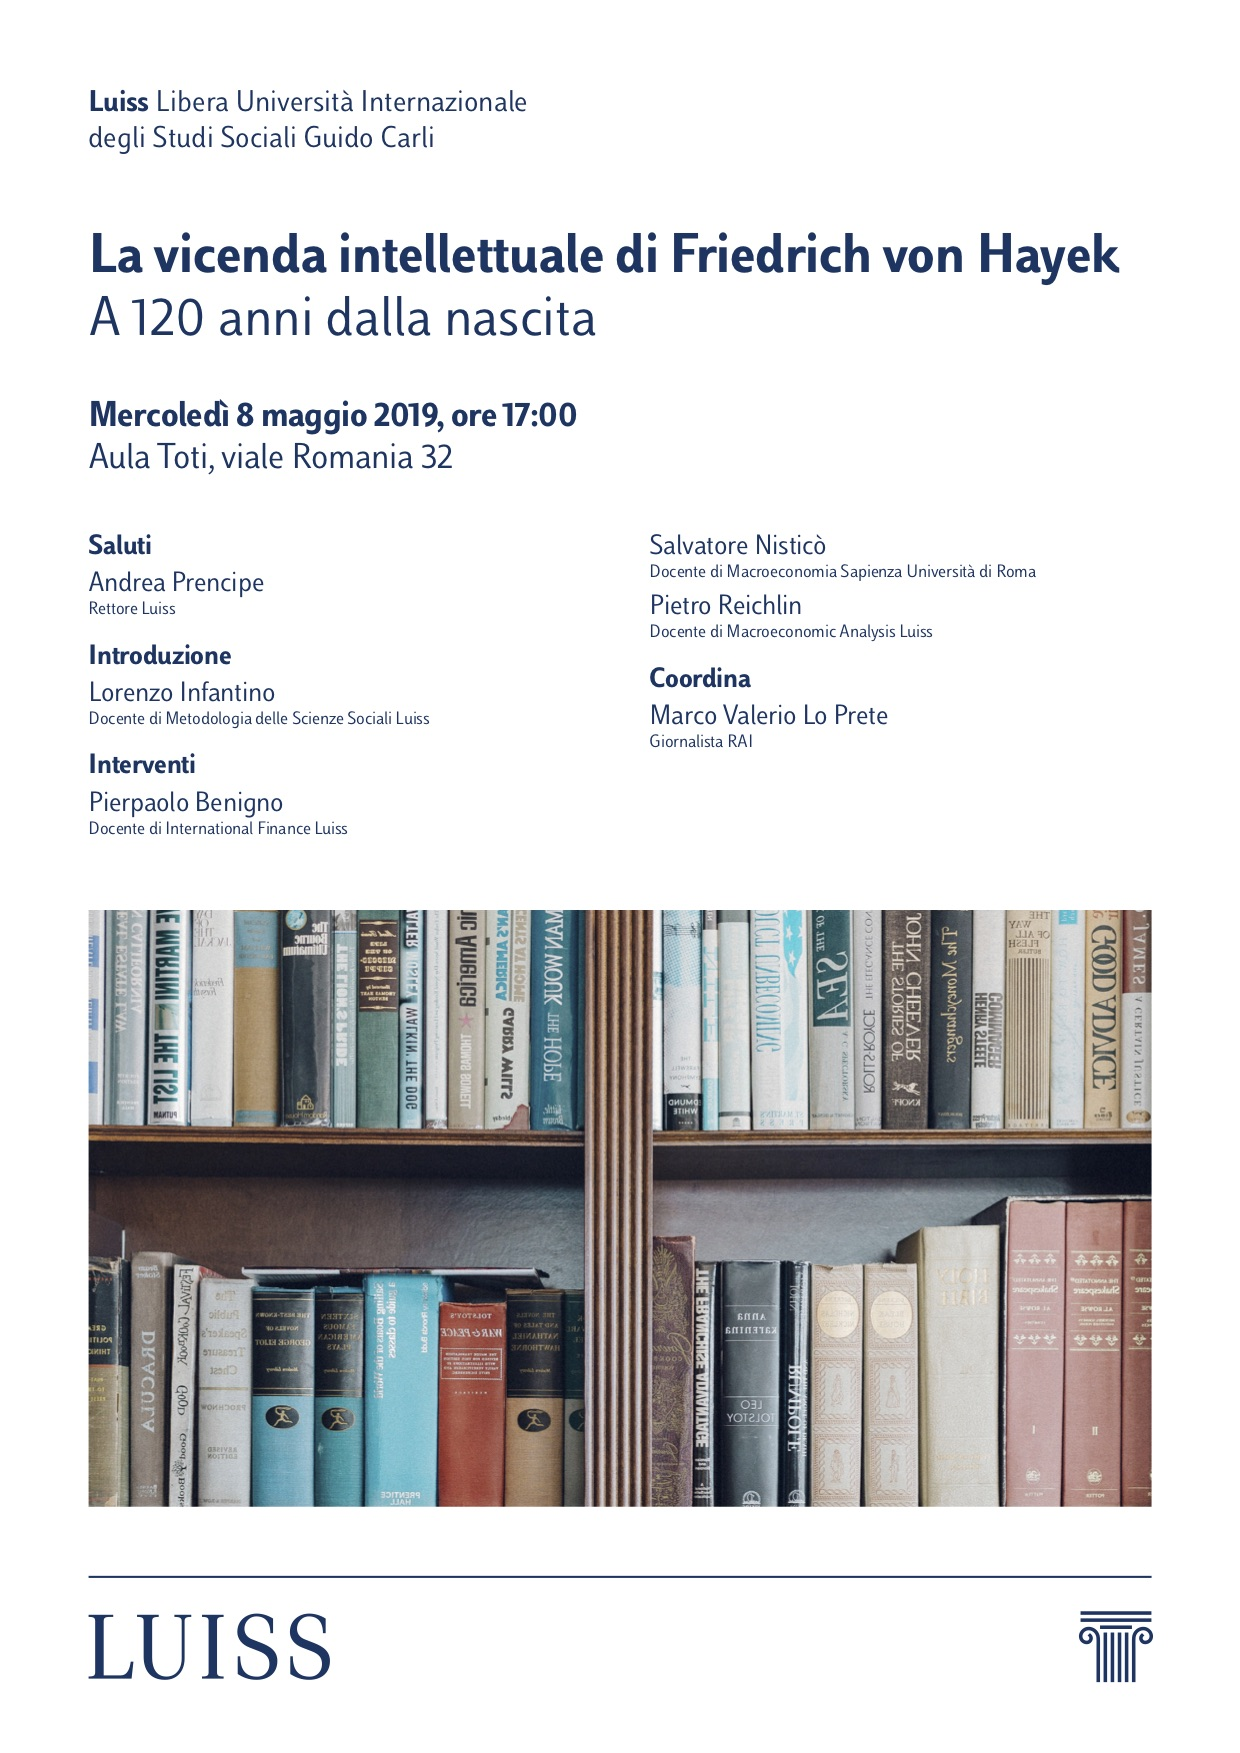 La vicenda intellettuale di Friedrich August von Hayek (a 120 anni dalla nascita)